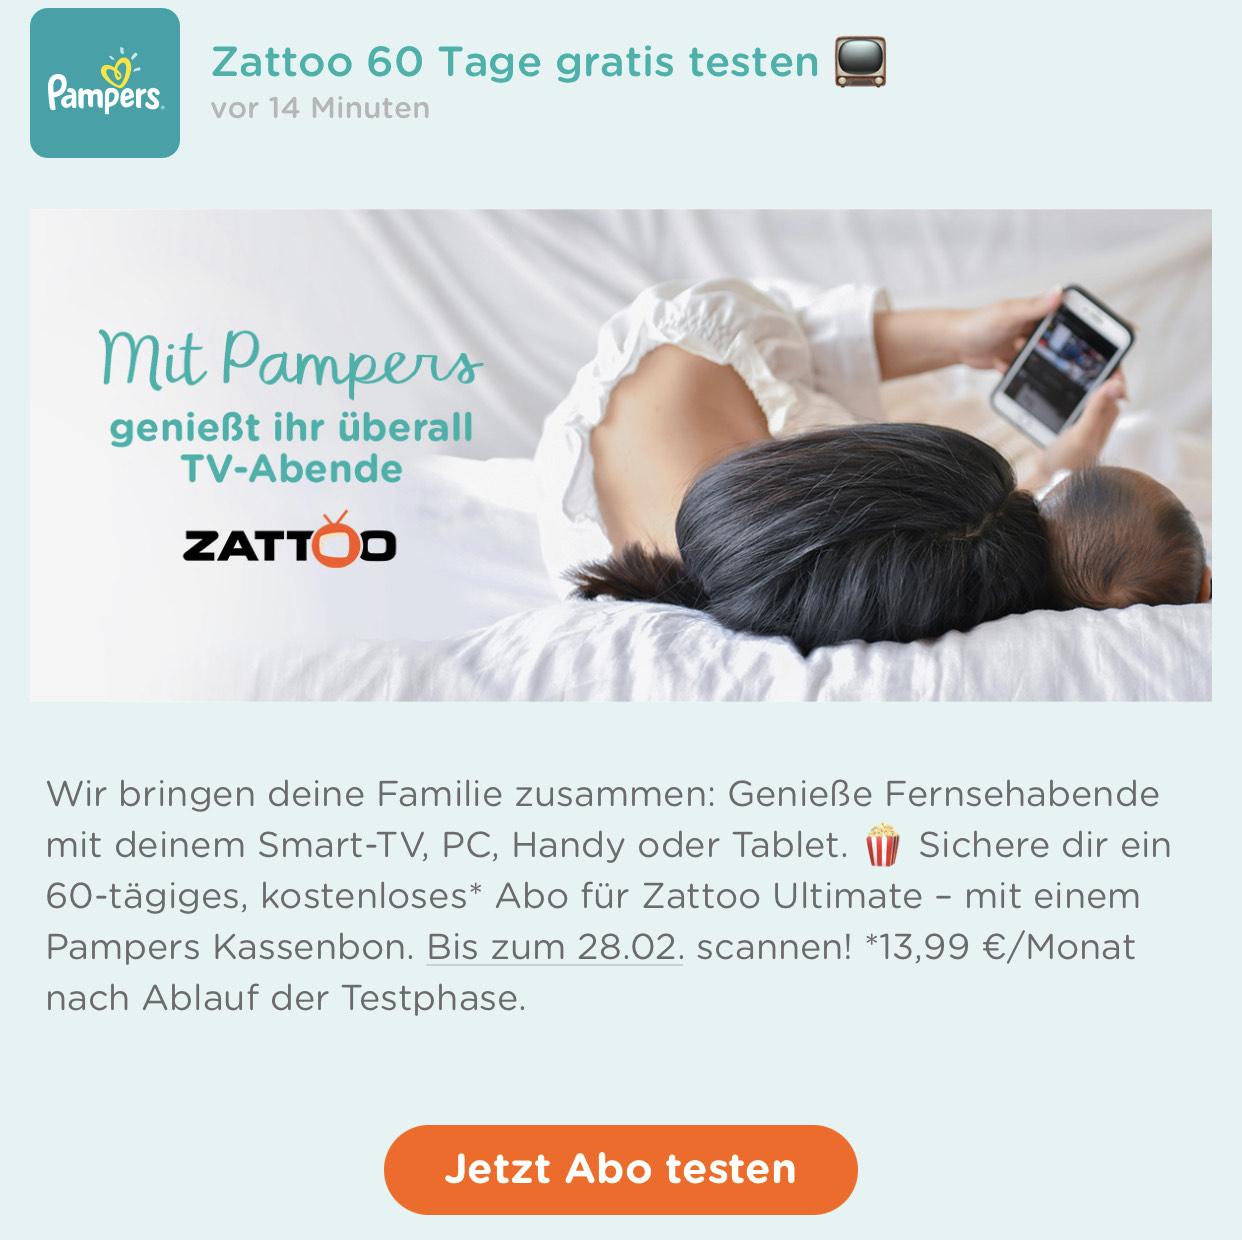 Zattoo Ultimate 2 Monate Gratis (Pampers App)